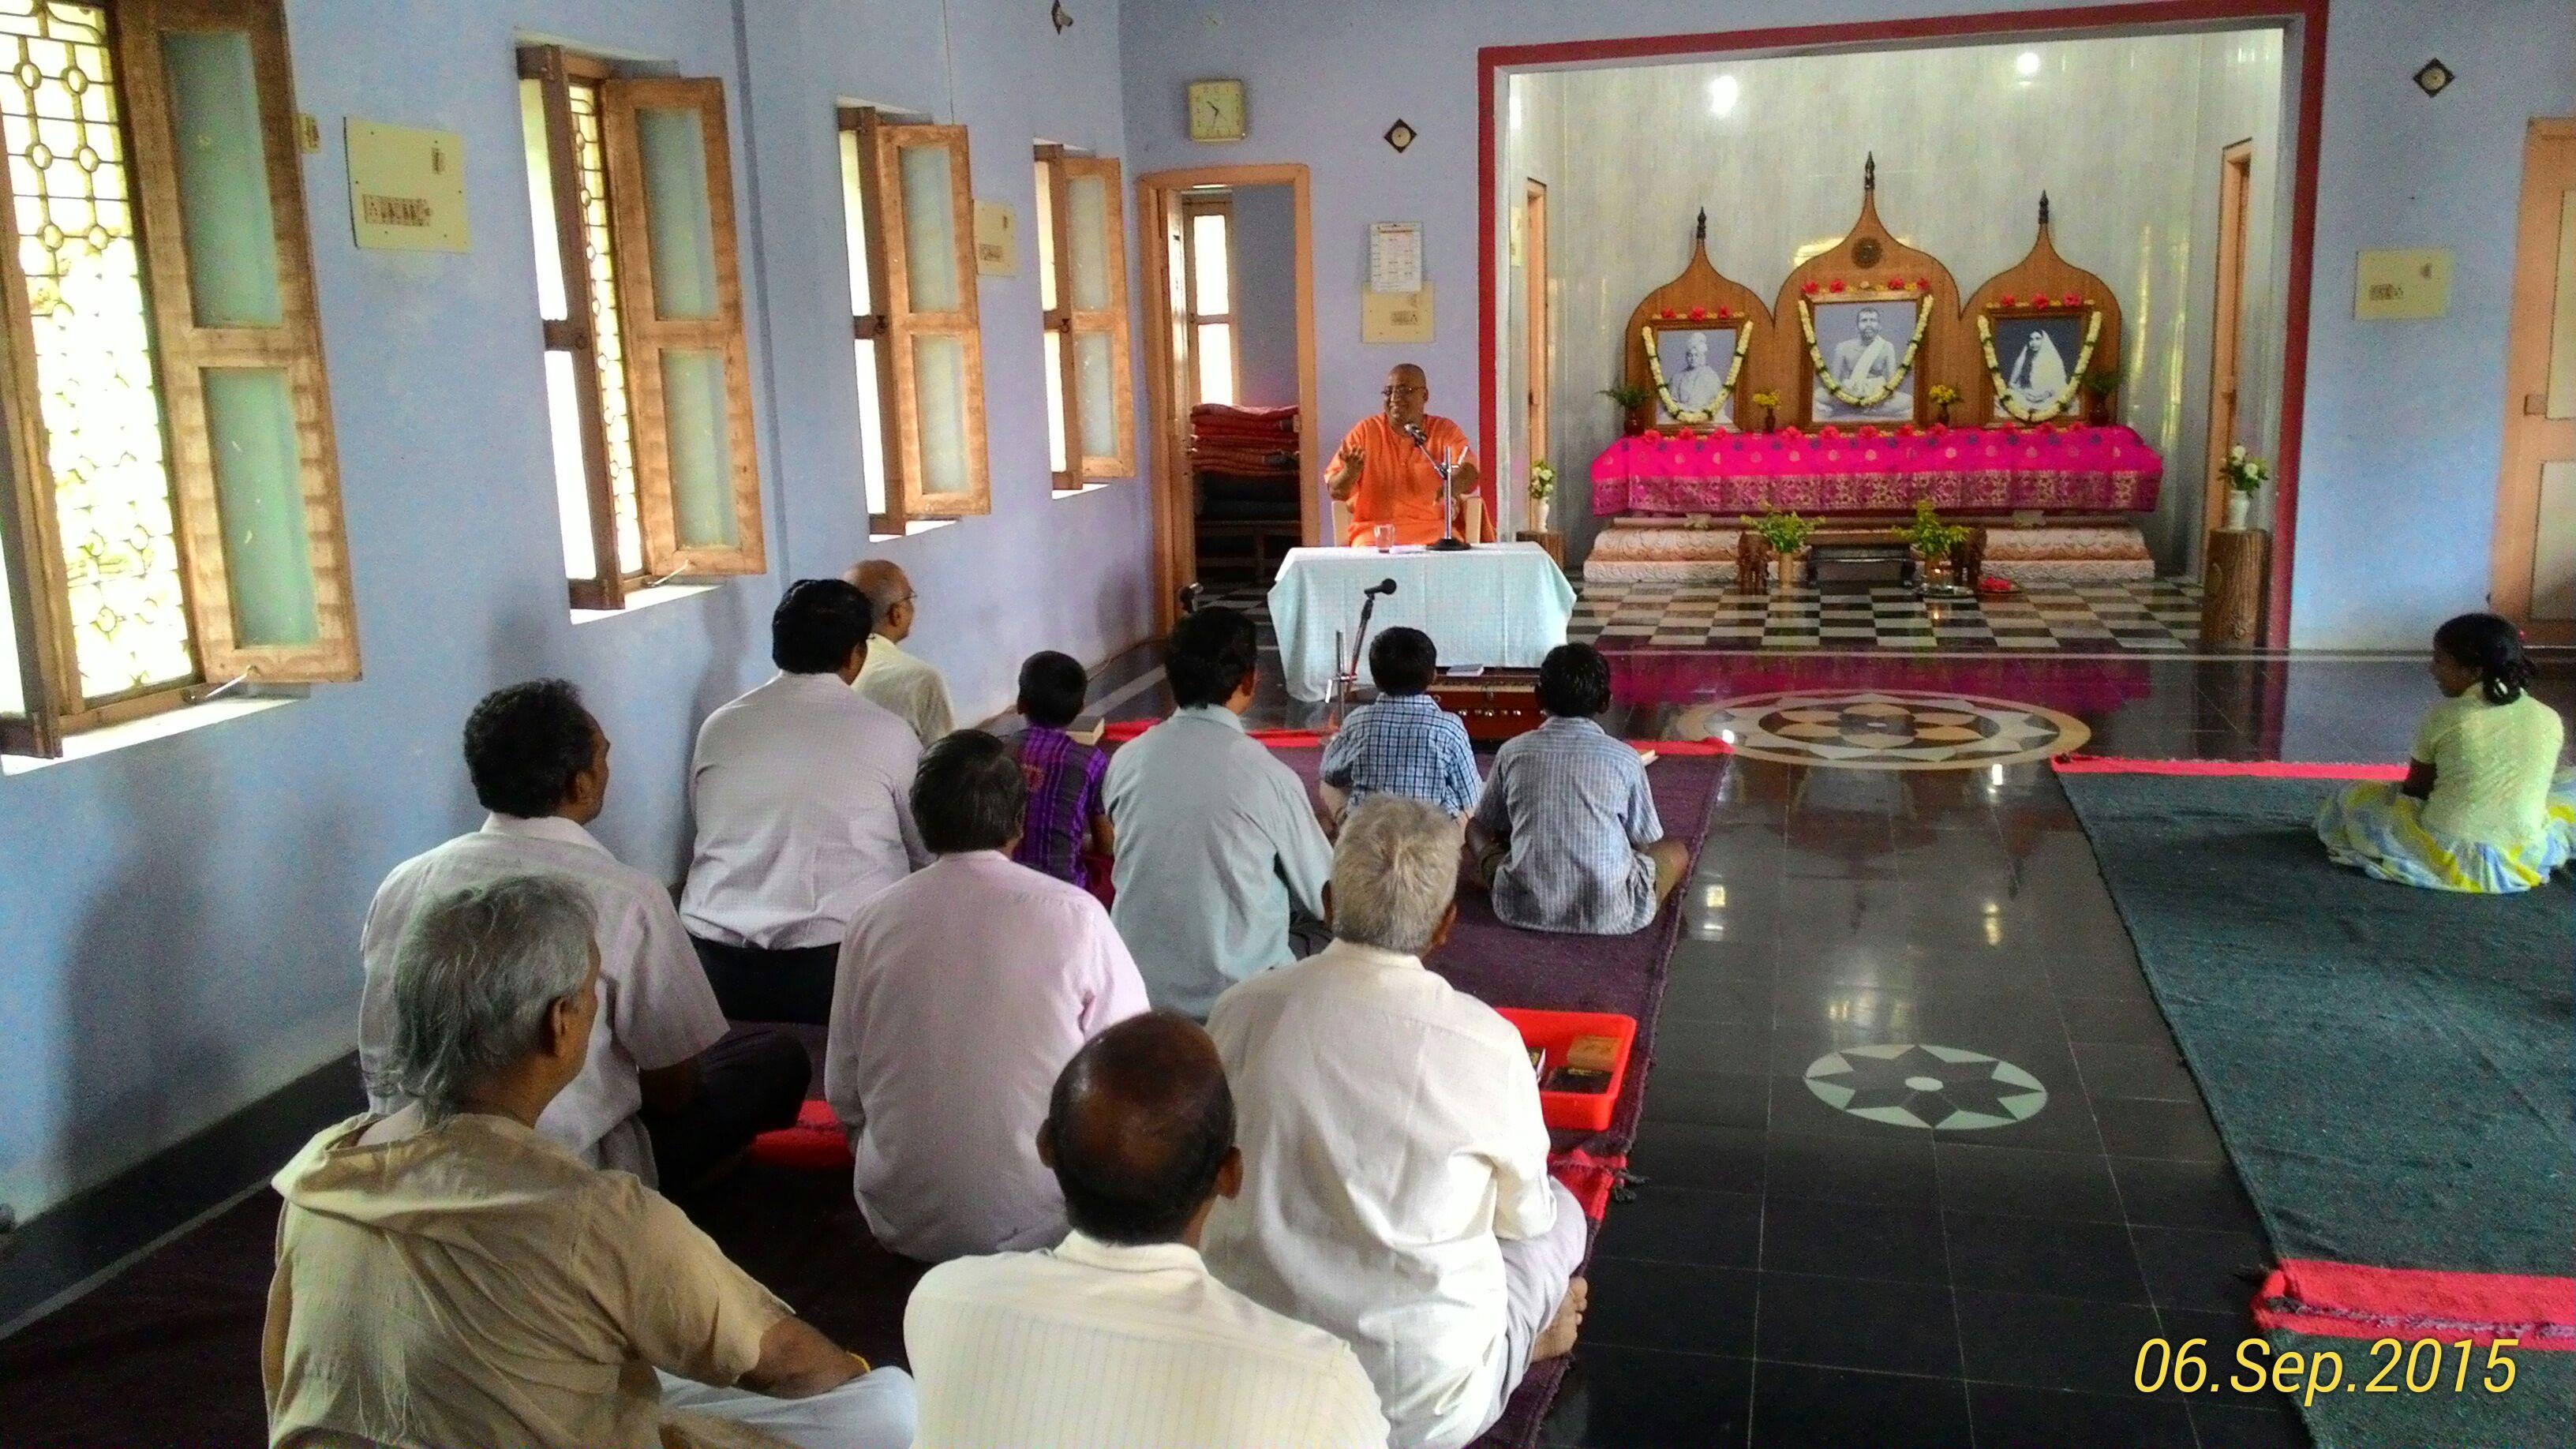 Rev. Swami Guneshanandaji addressing the devotees.